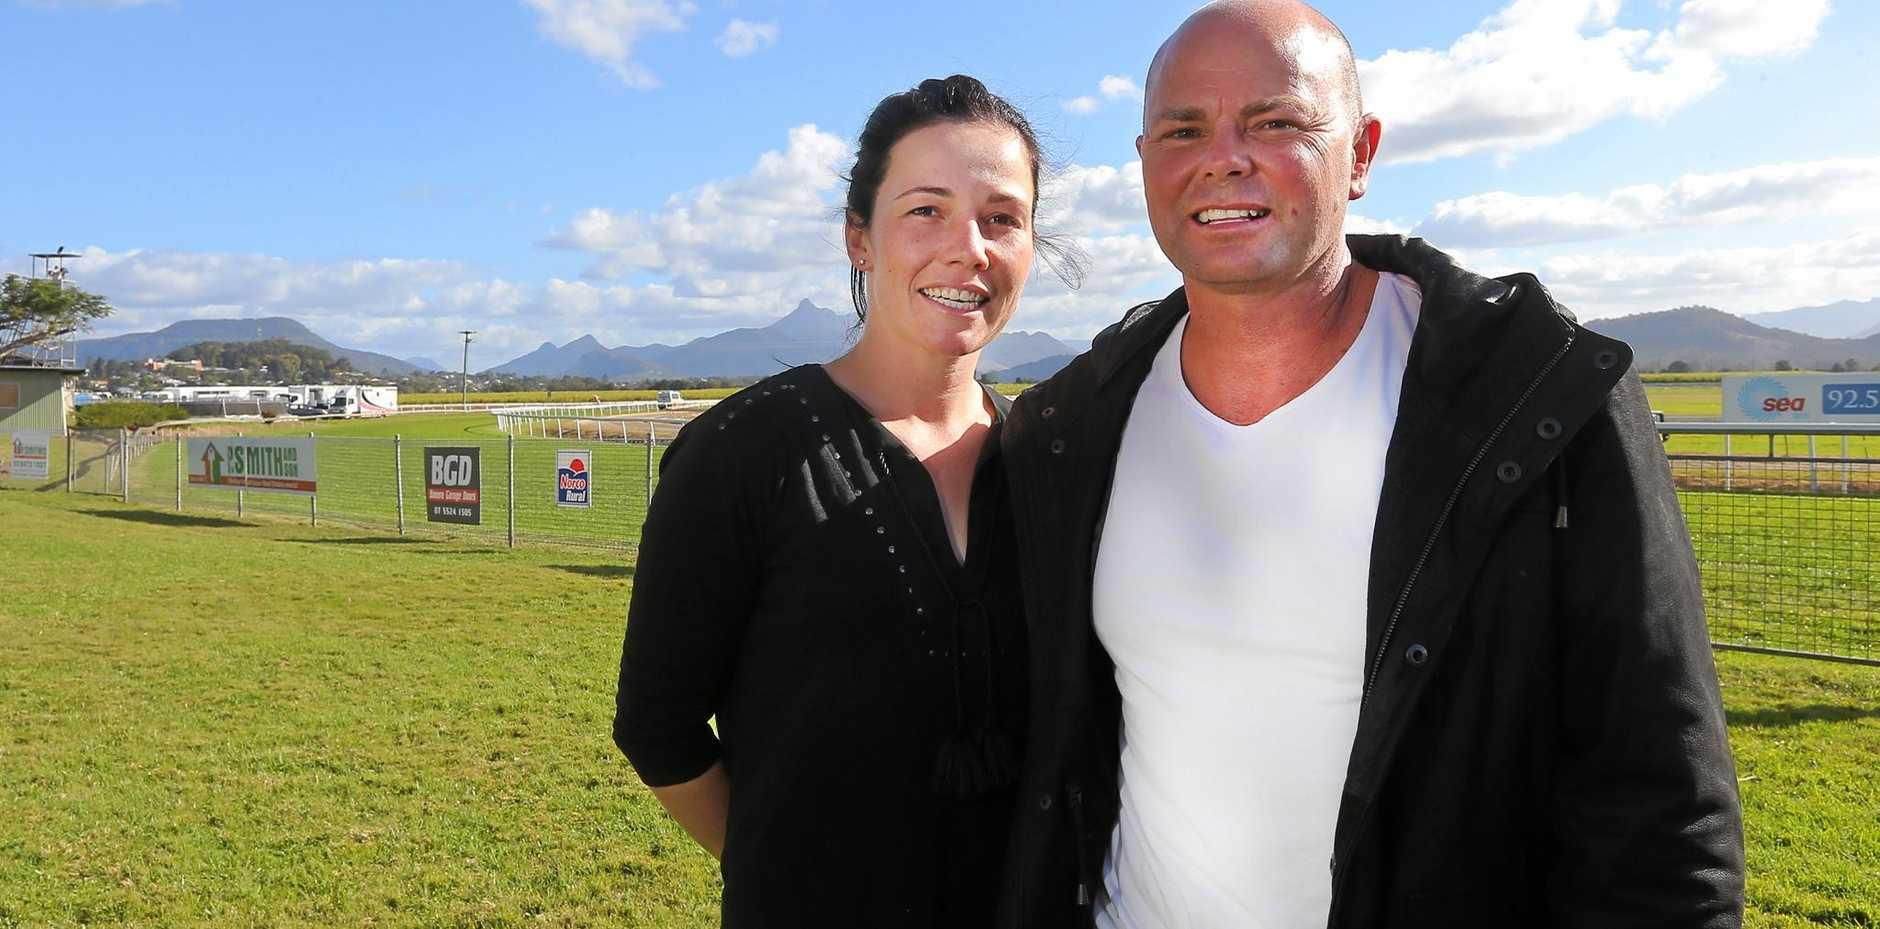 TRAINING MASTERS: Matt and Keira Dunn at a Murwillumbah Racecourse race day.